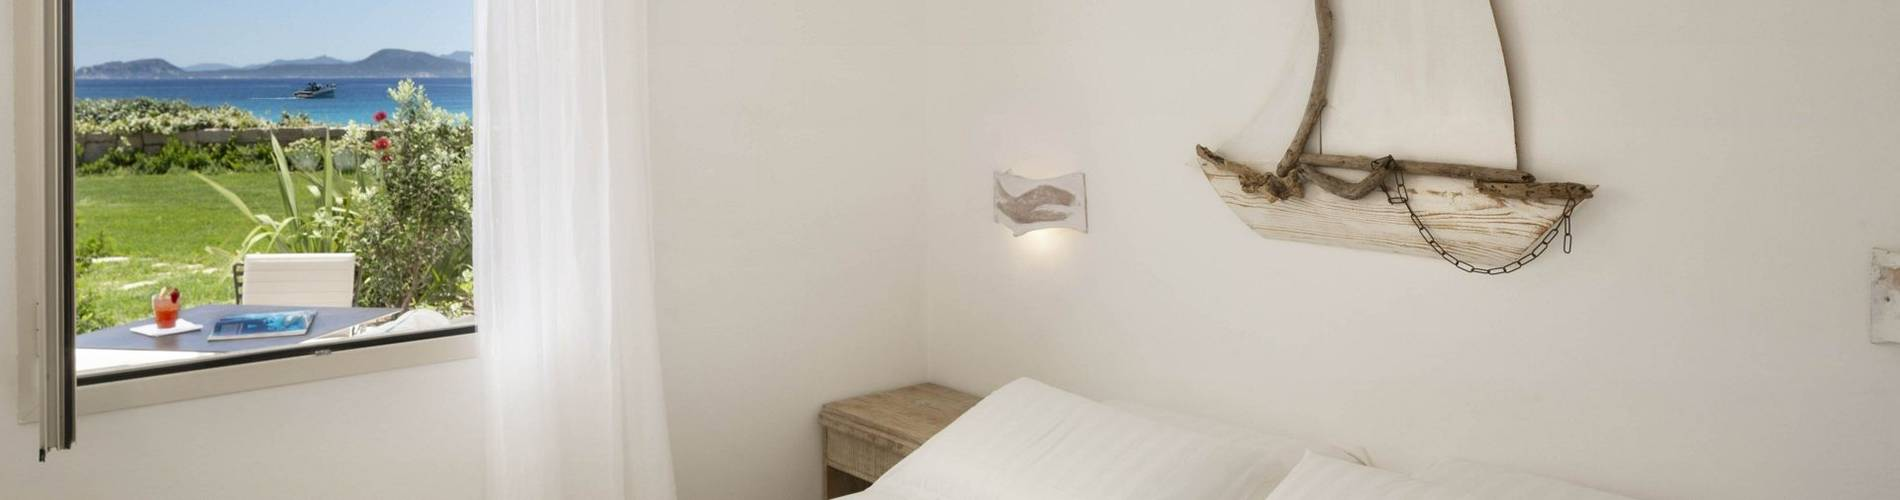 2 Charming Suite - Gabbiano Azzurro Sardegna - first bedroom.jpg